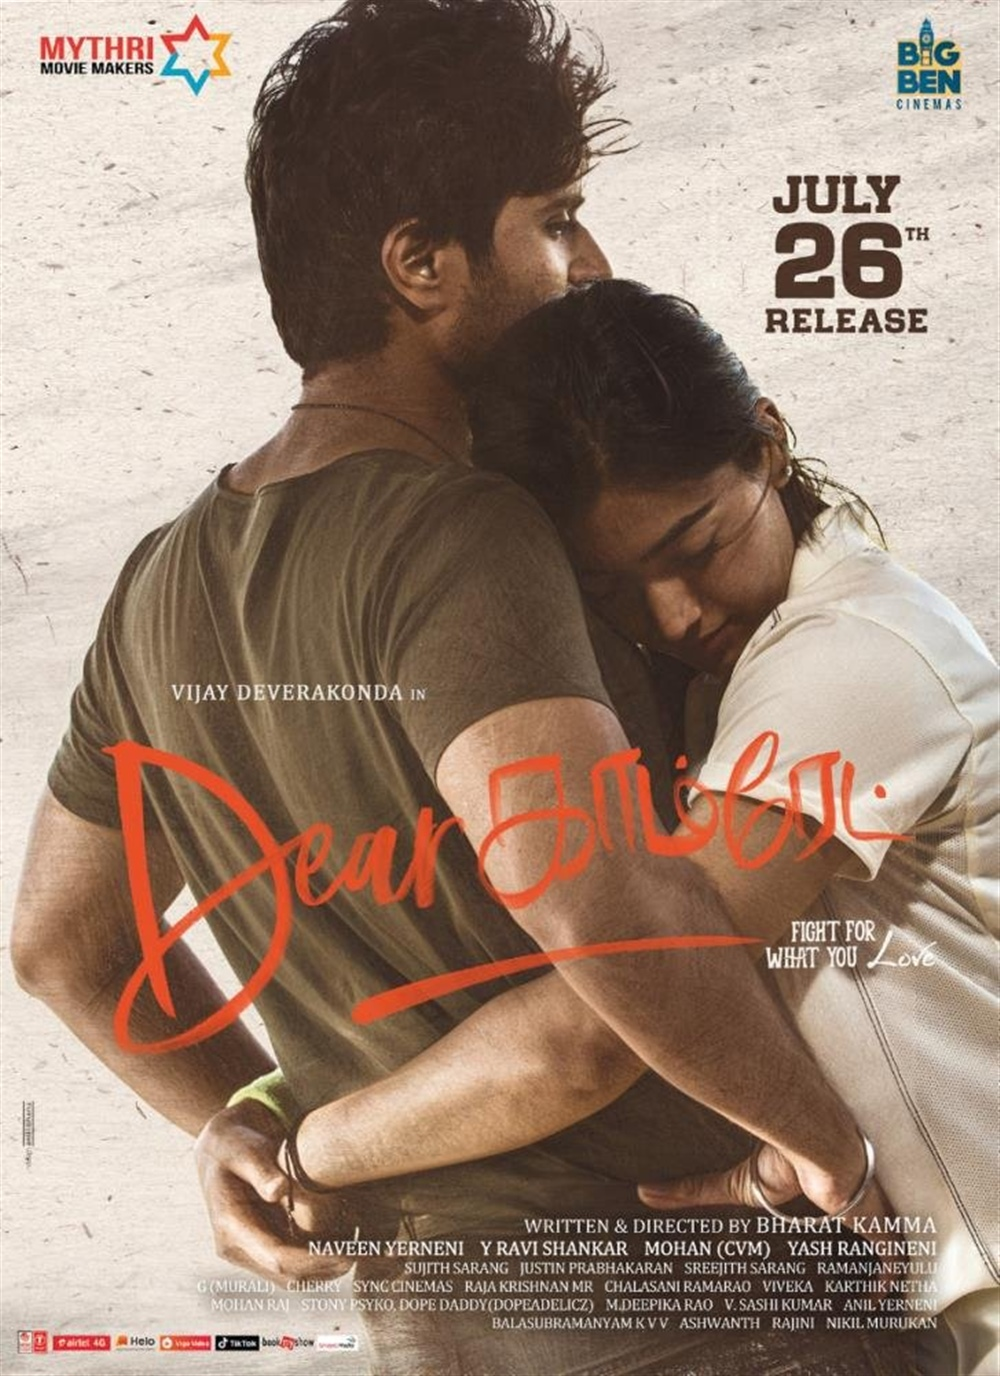 Vijay Devarakonda Rashmika Mandanna Dear Comrade Tamil Movie Release Posters